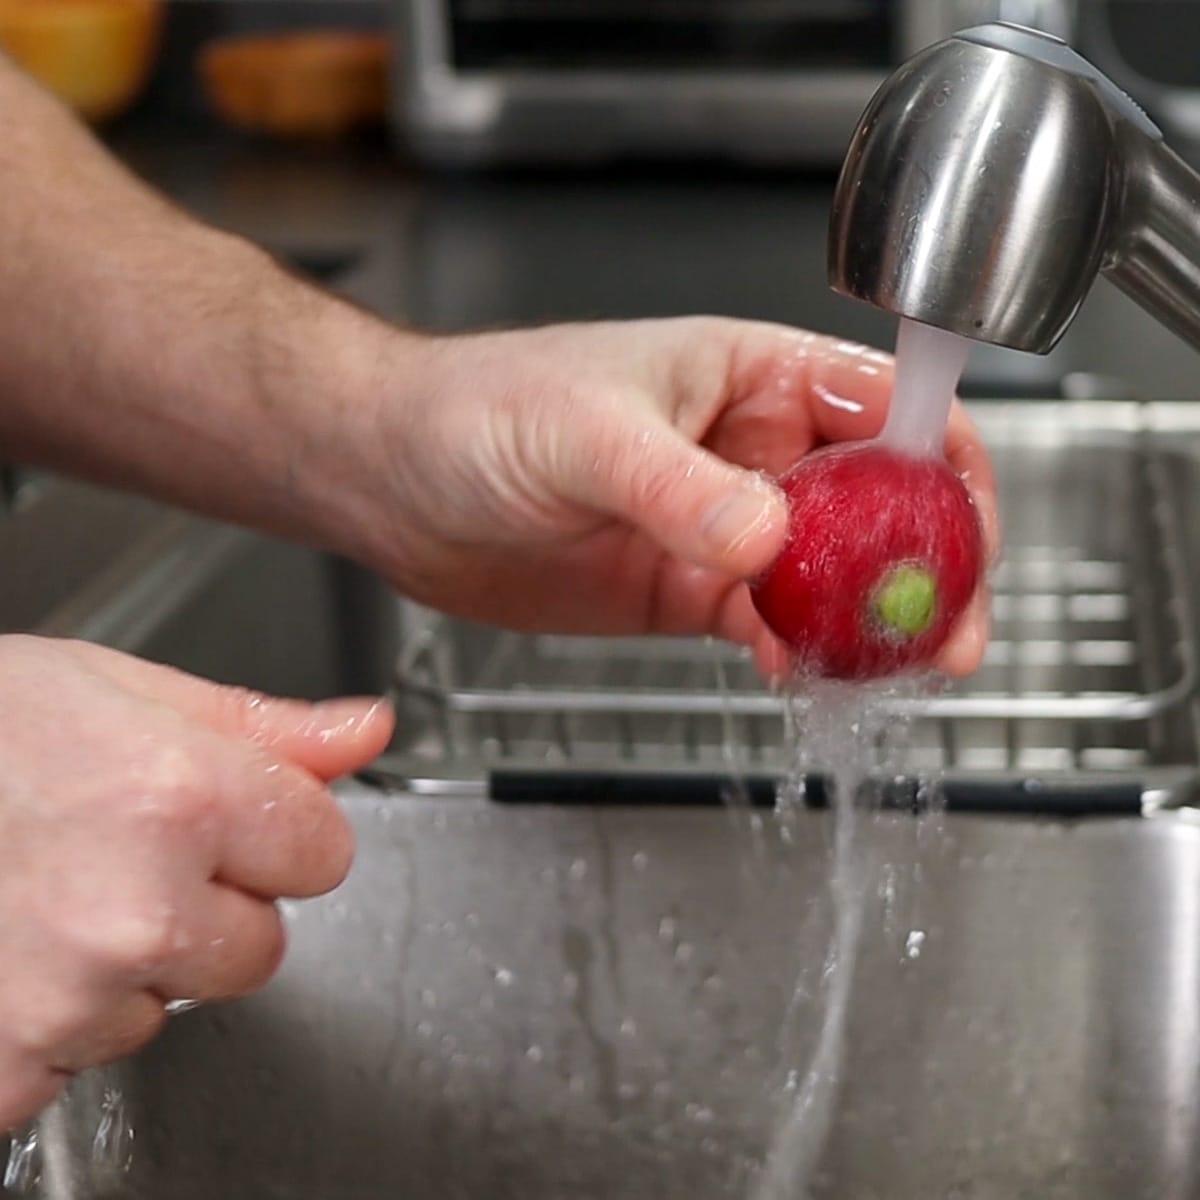 washing radish under cold water faucet